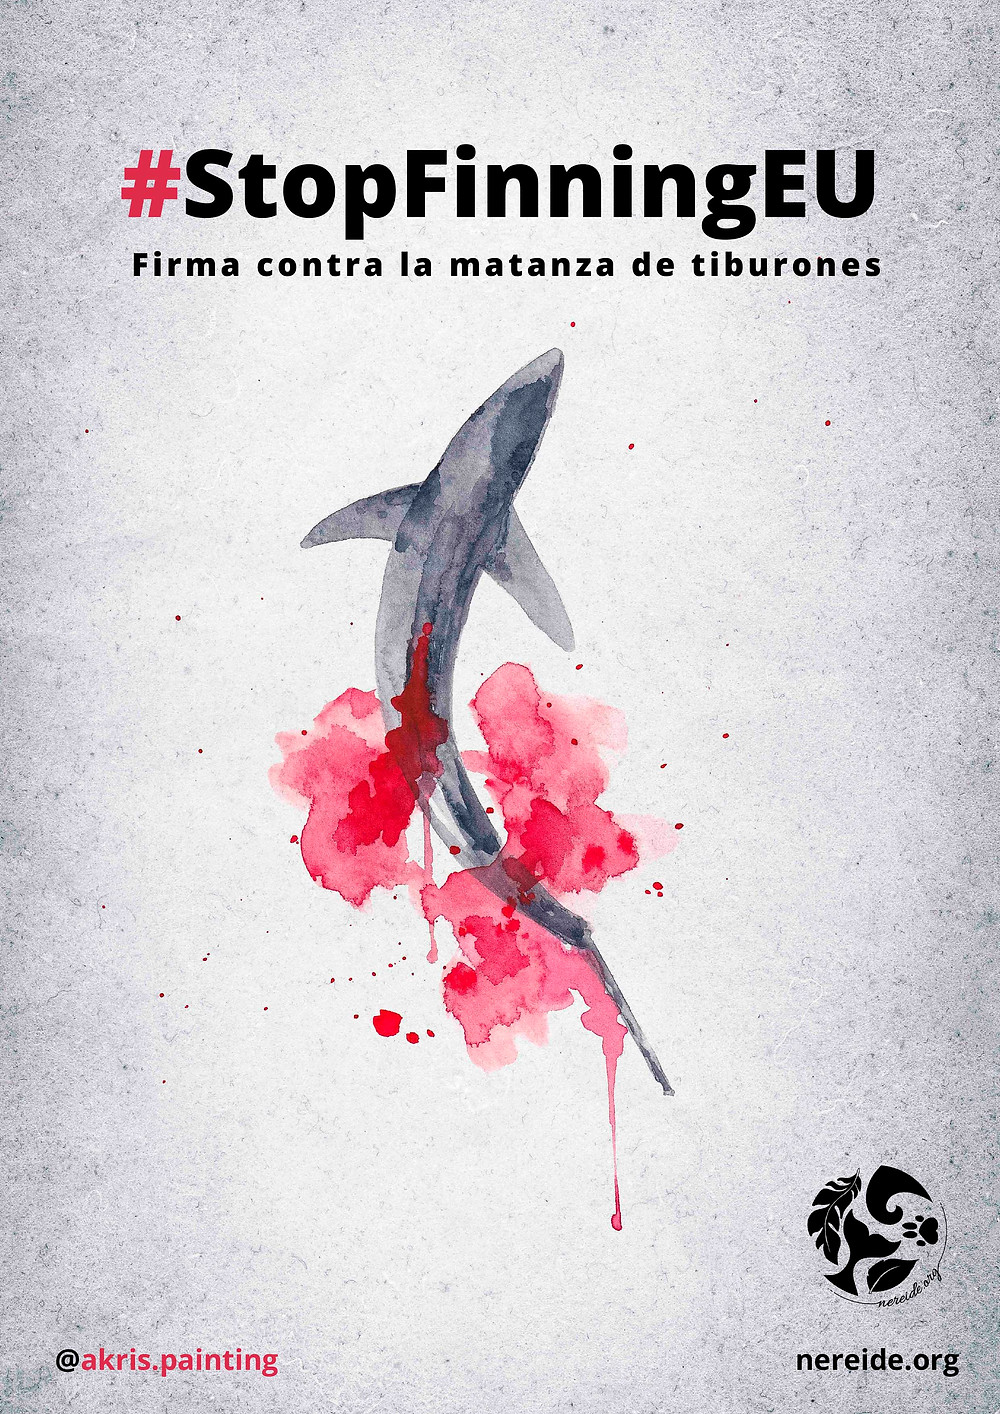 Stopfinningeu, finning, shark, matanza de tiburones, stop finning europa españa